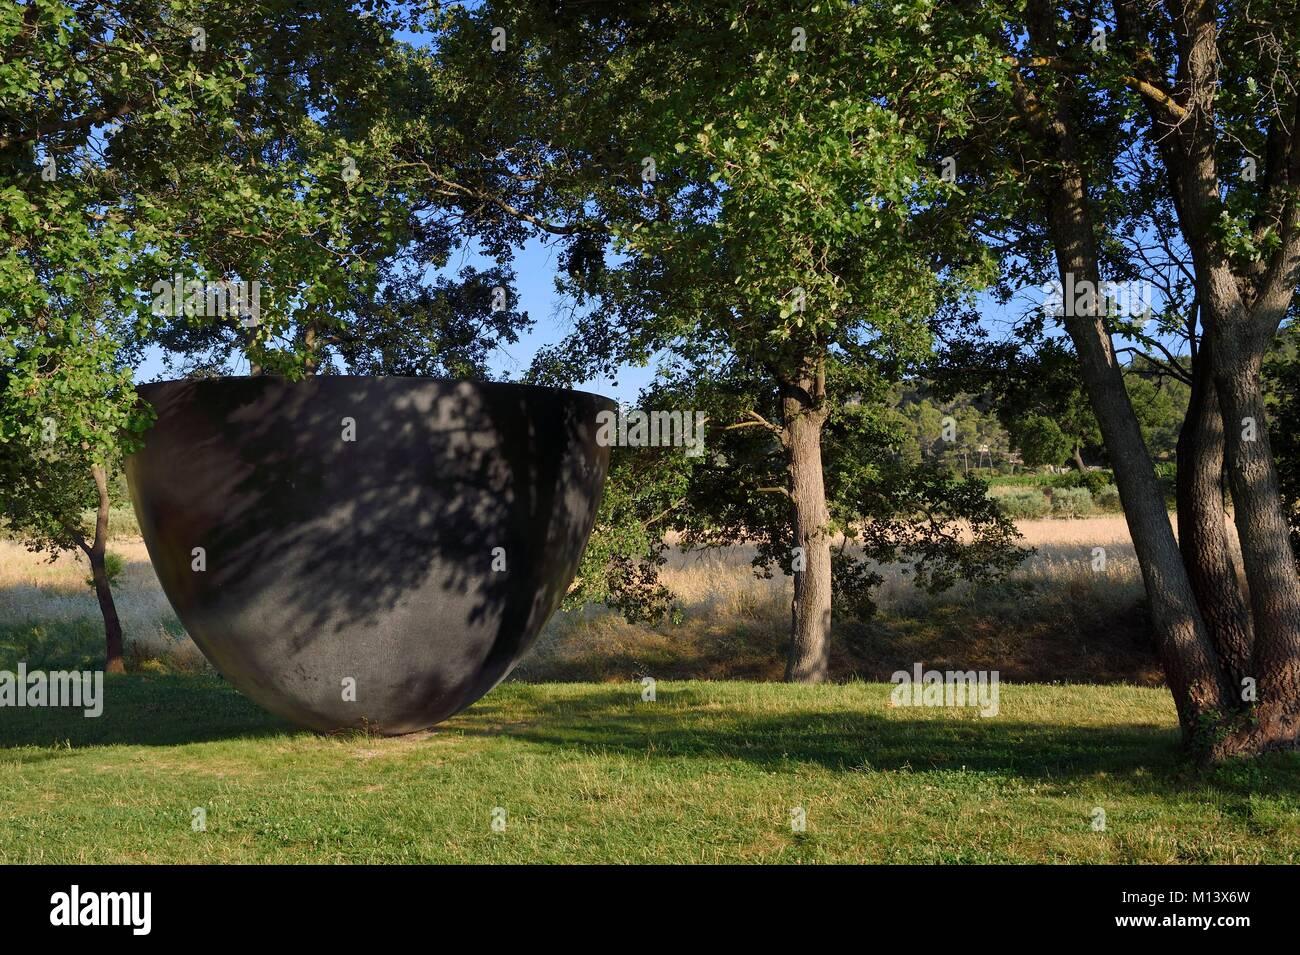 France, Bouches du Rhone, Le Puy Sainte Reparade, Chateau La Coste vineyard and contemporary art center, monumental - Stock Image